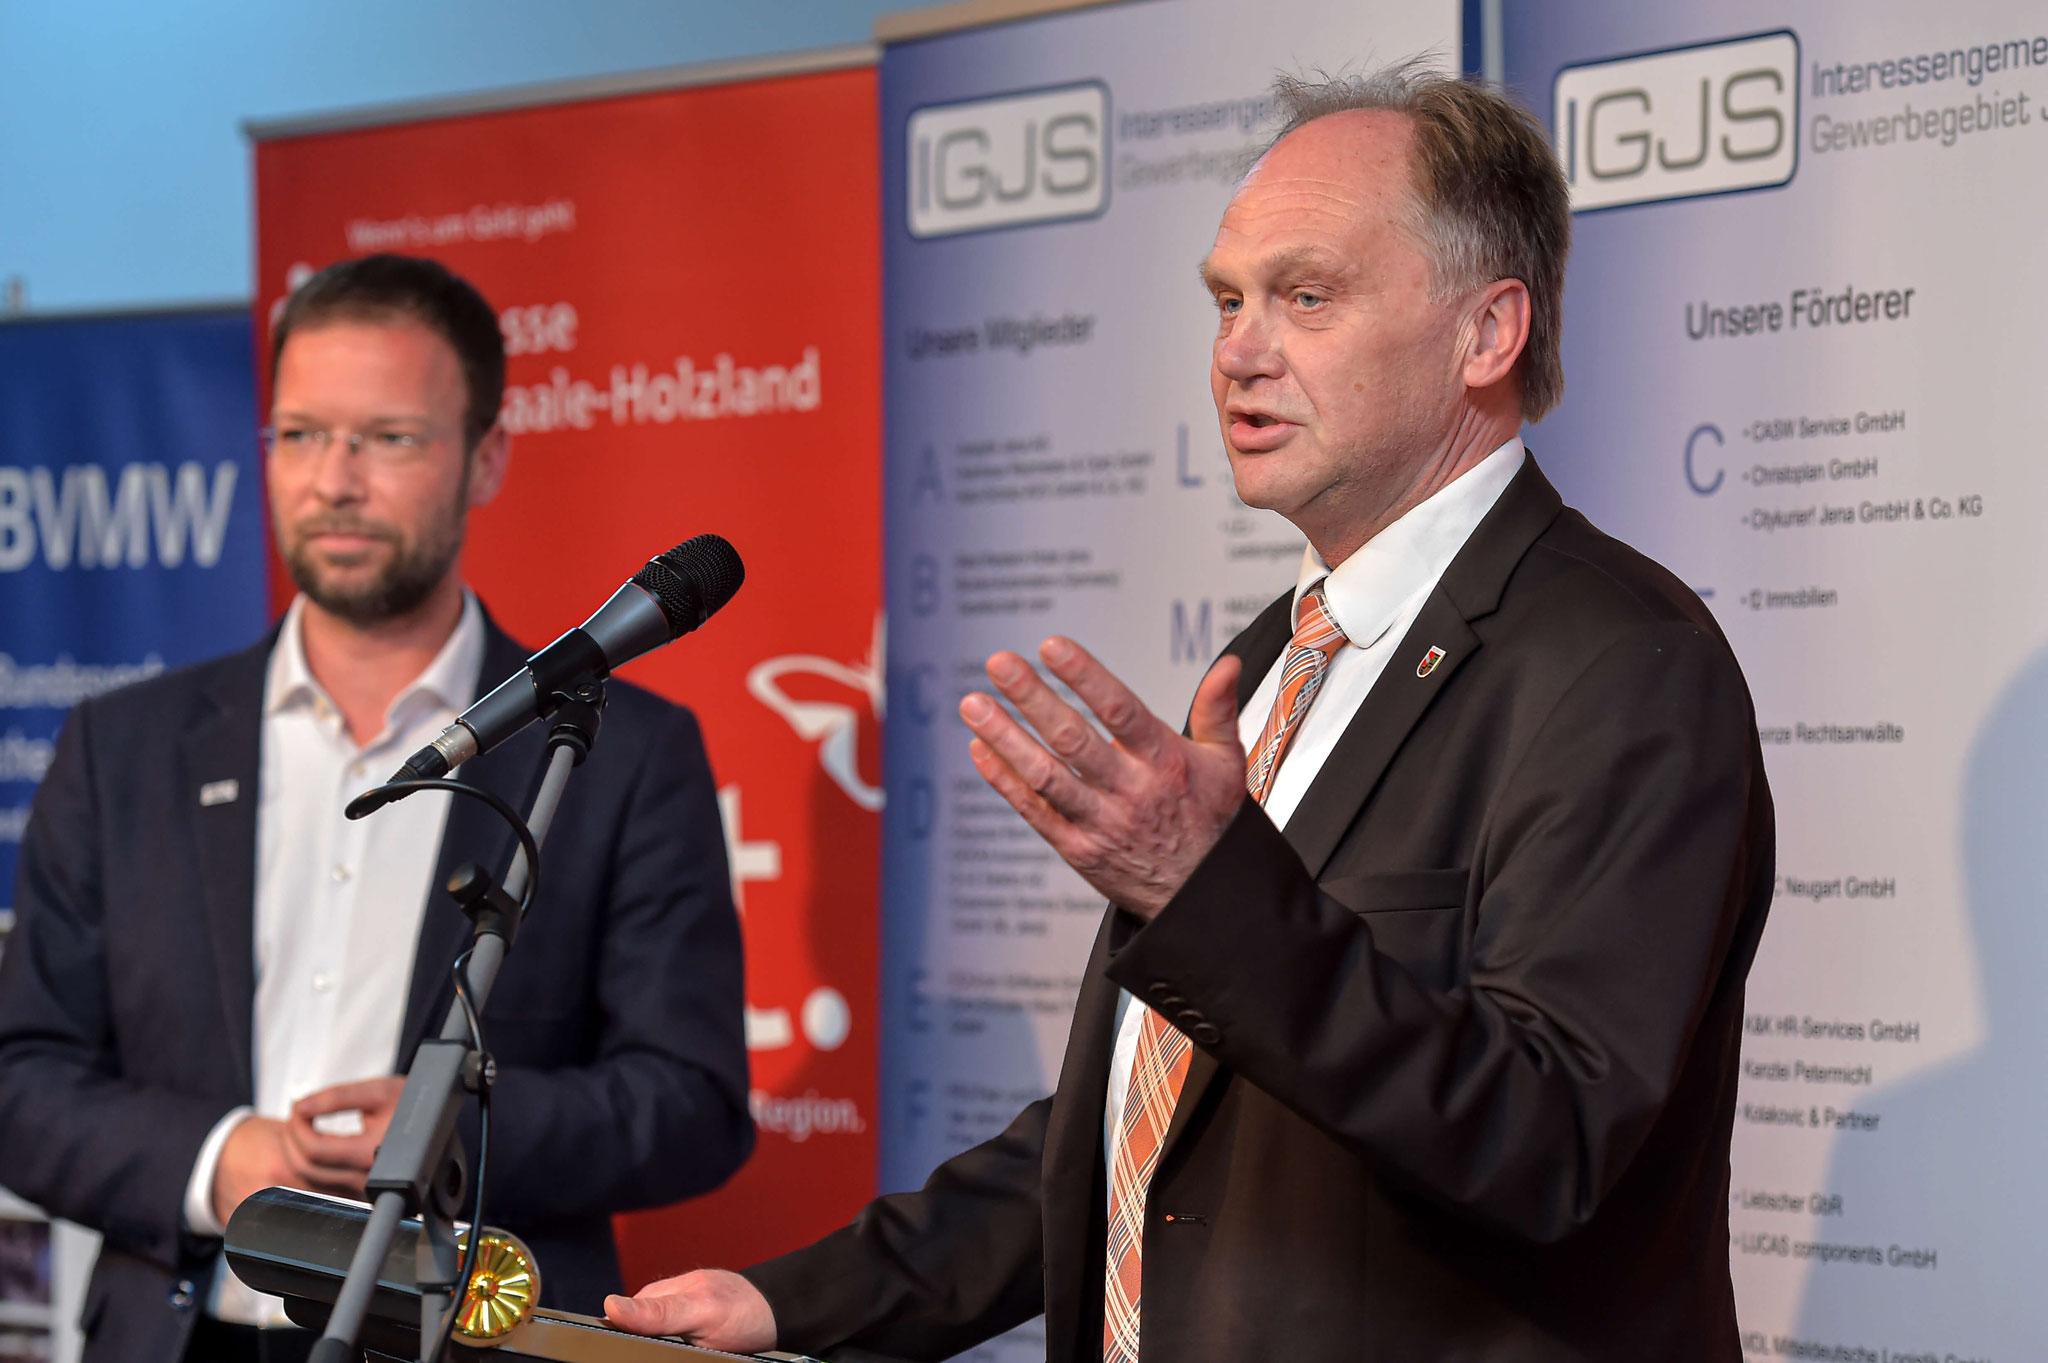 Andreas Heller, Landrat des Saale-Holzland-Kreises, bei seiner Ansprache